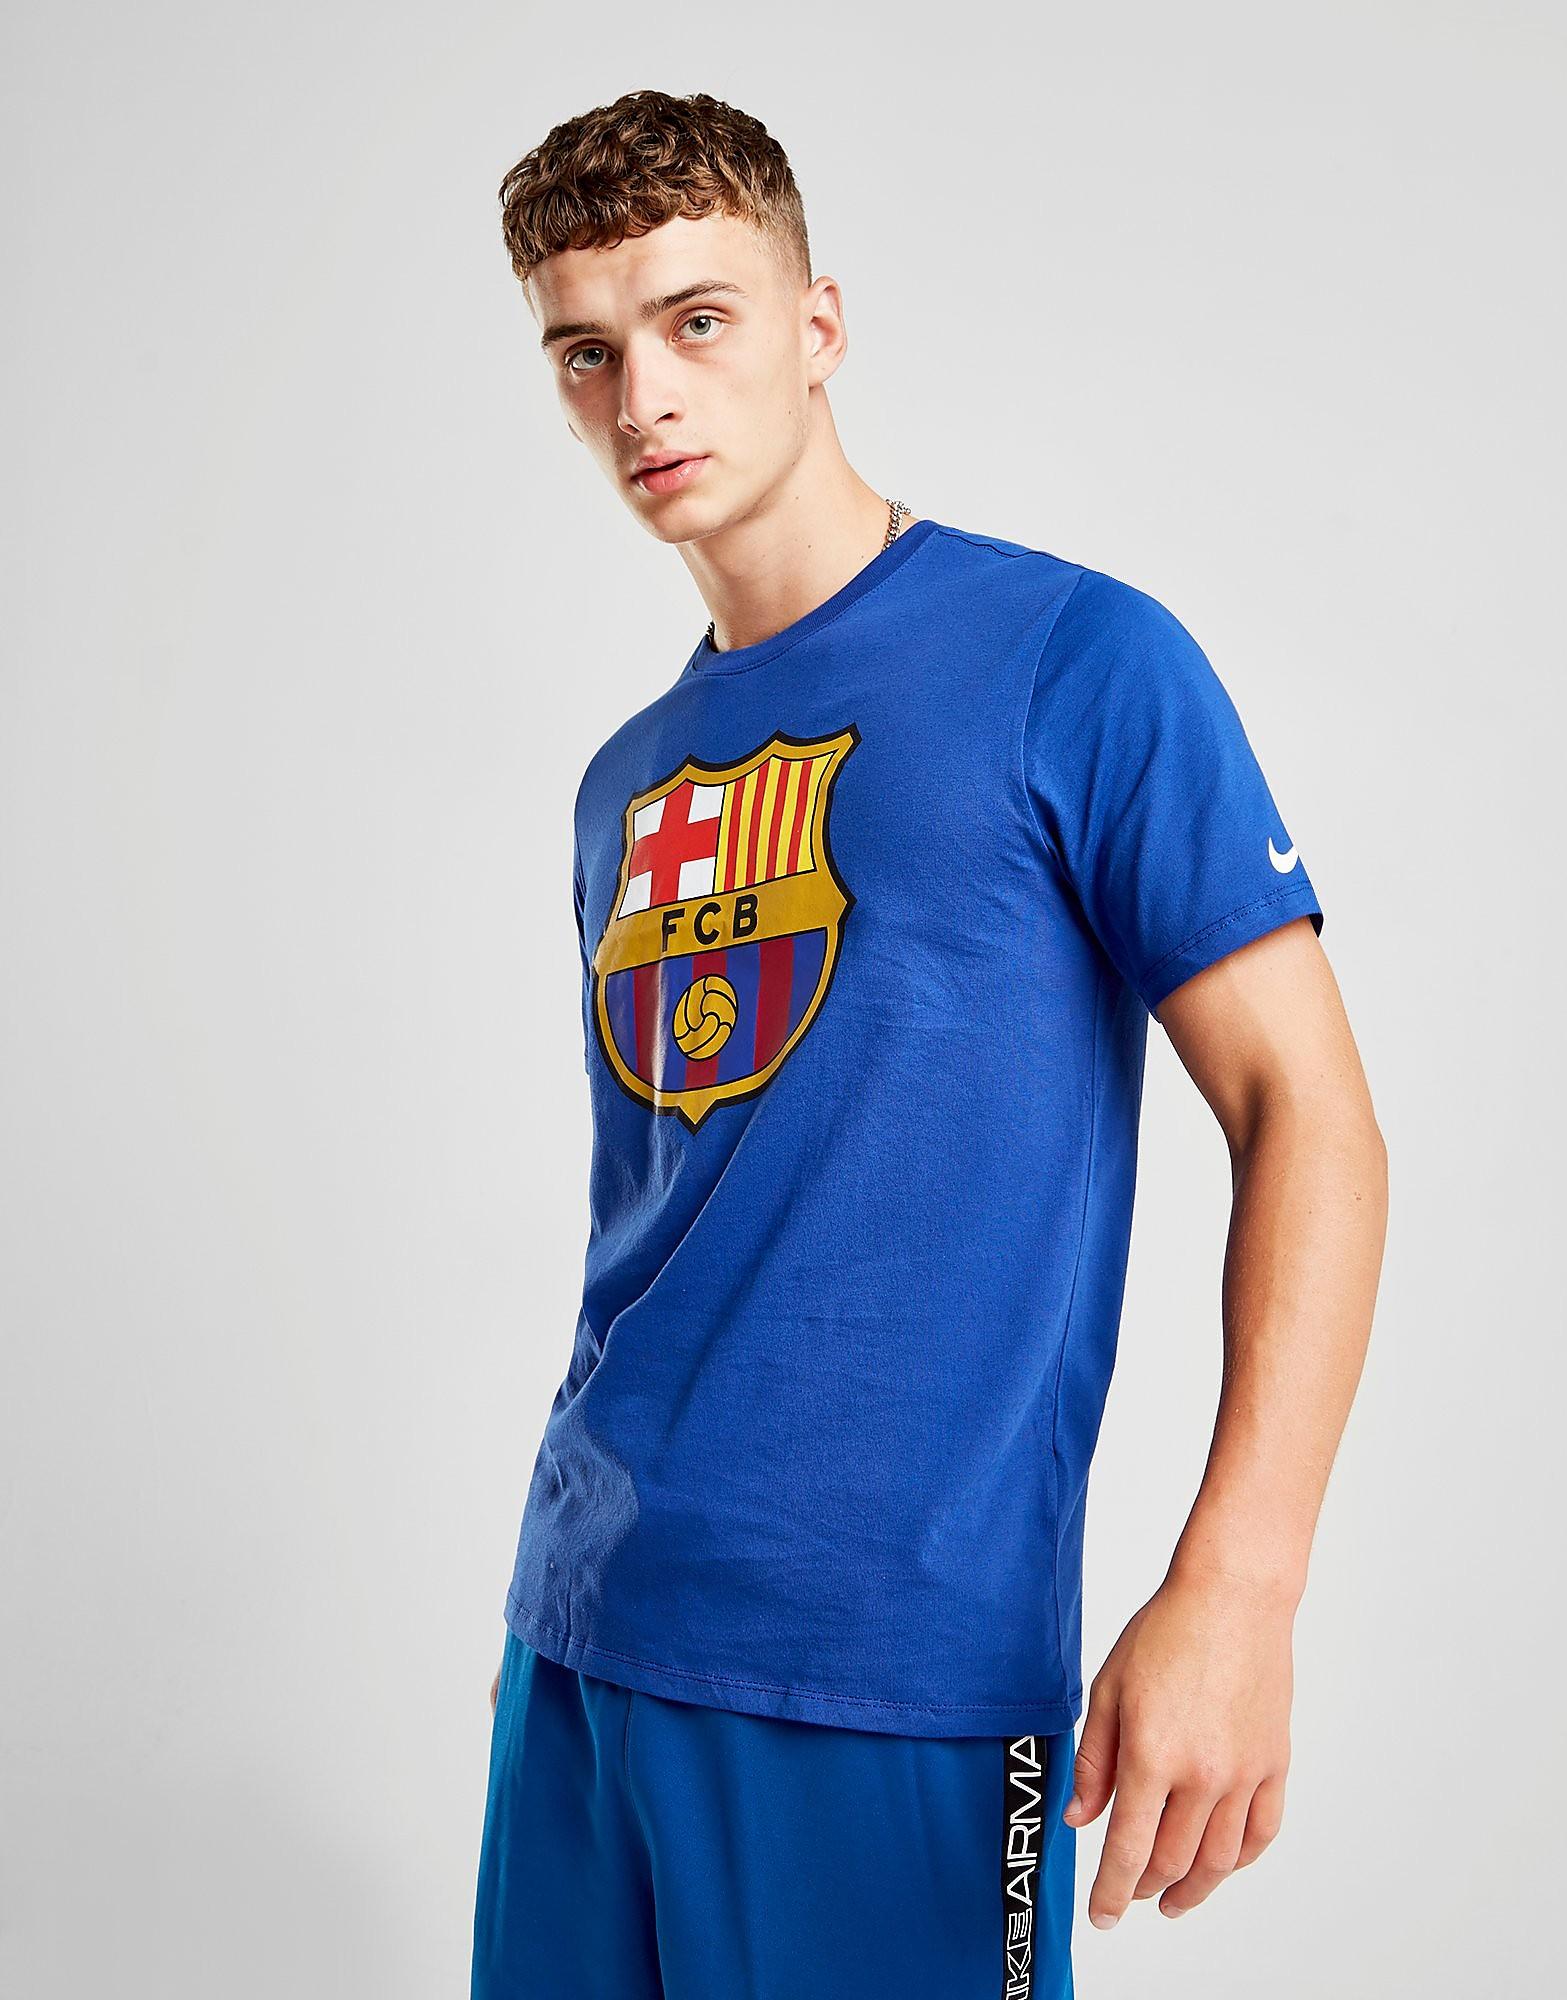 Nike FC Barcelona Crest T-Shirt - Blauw - Heren